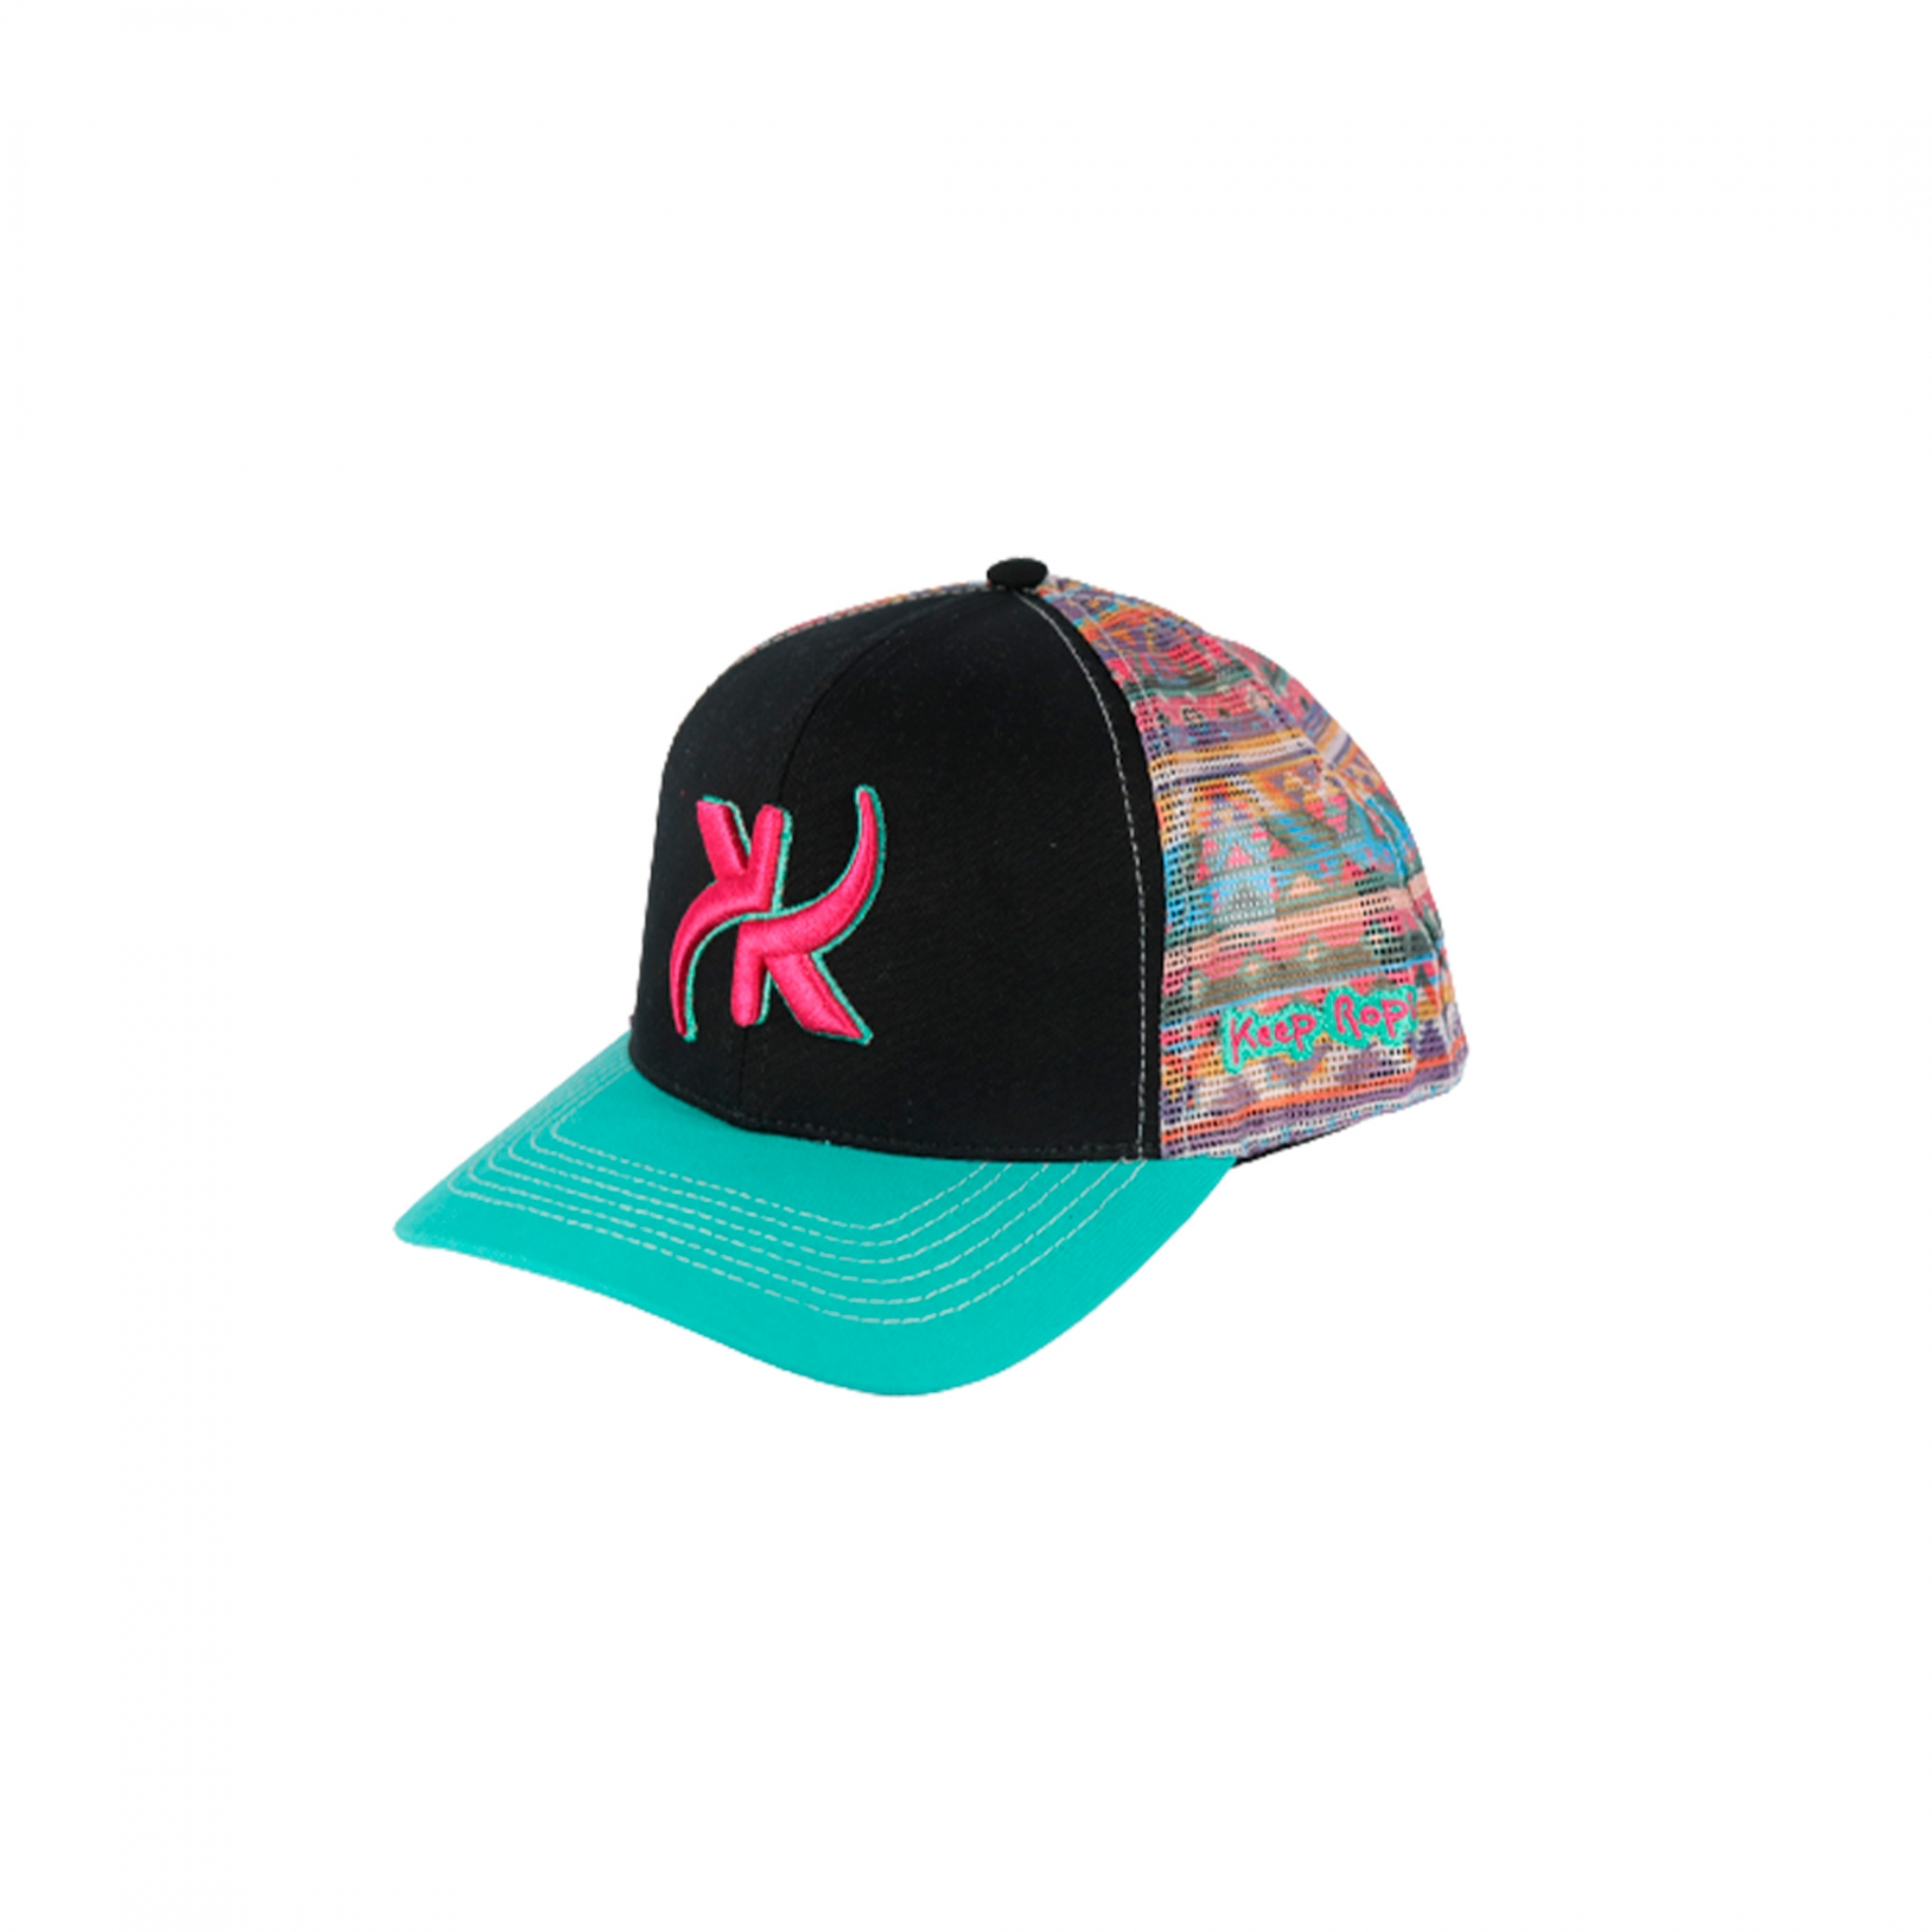 Boné Keep Roping Trucker Hat com aba curva Preto/Sublimado